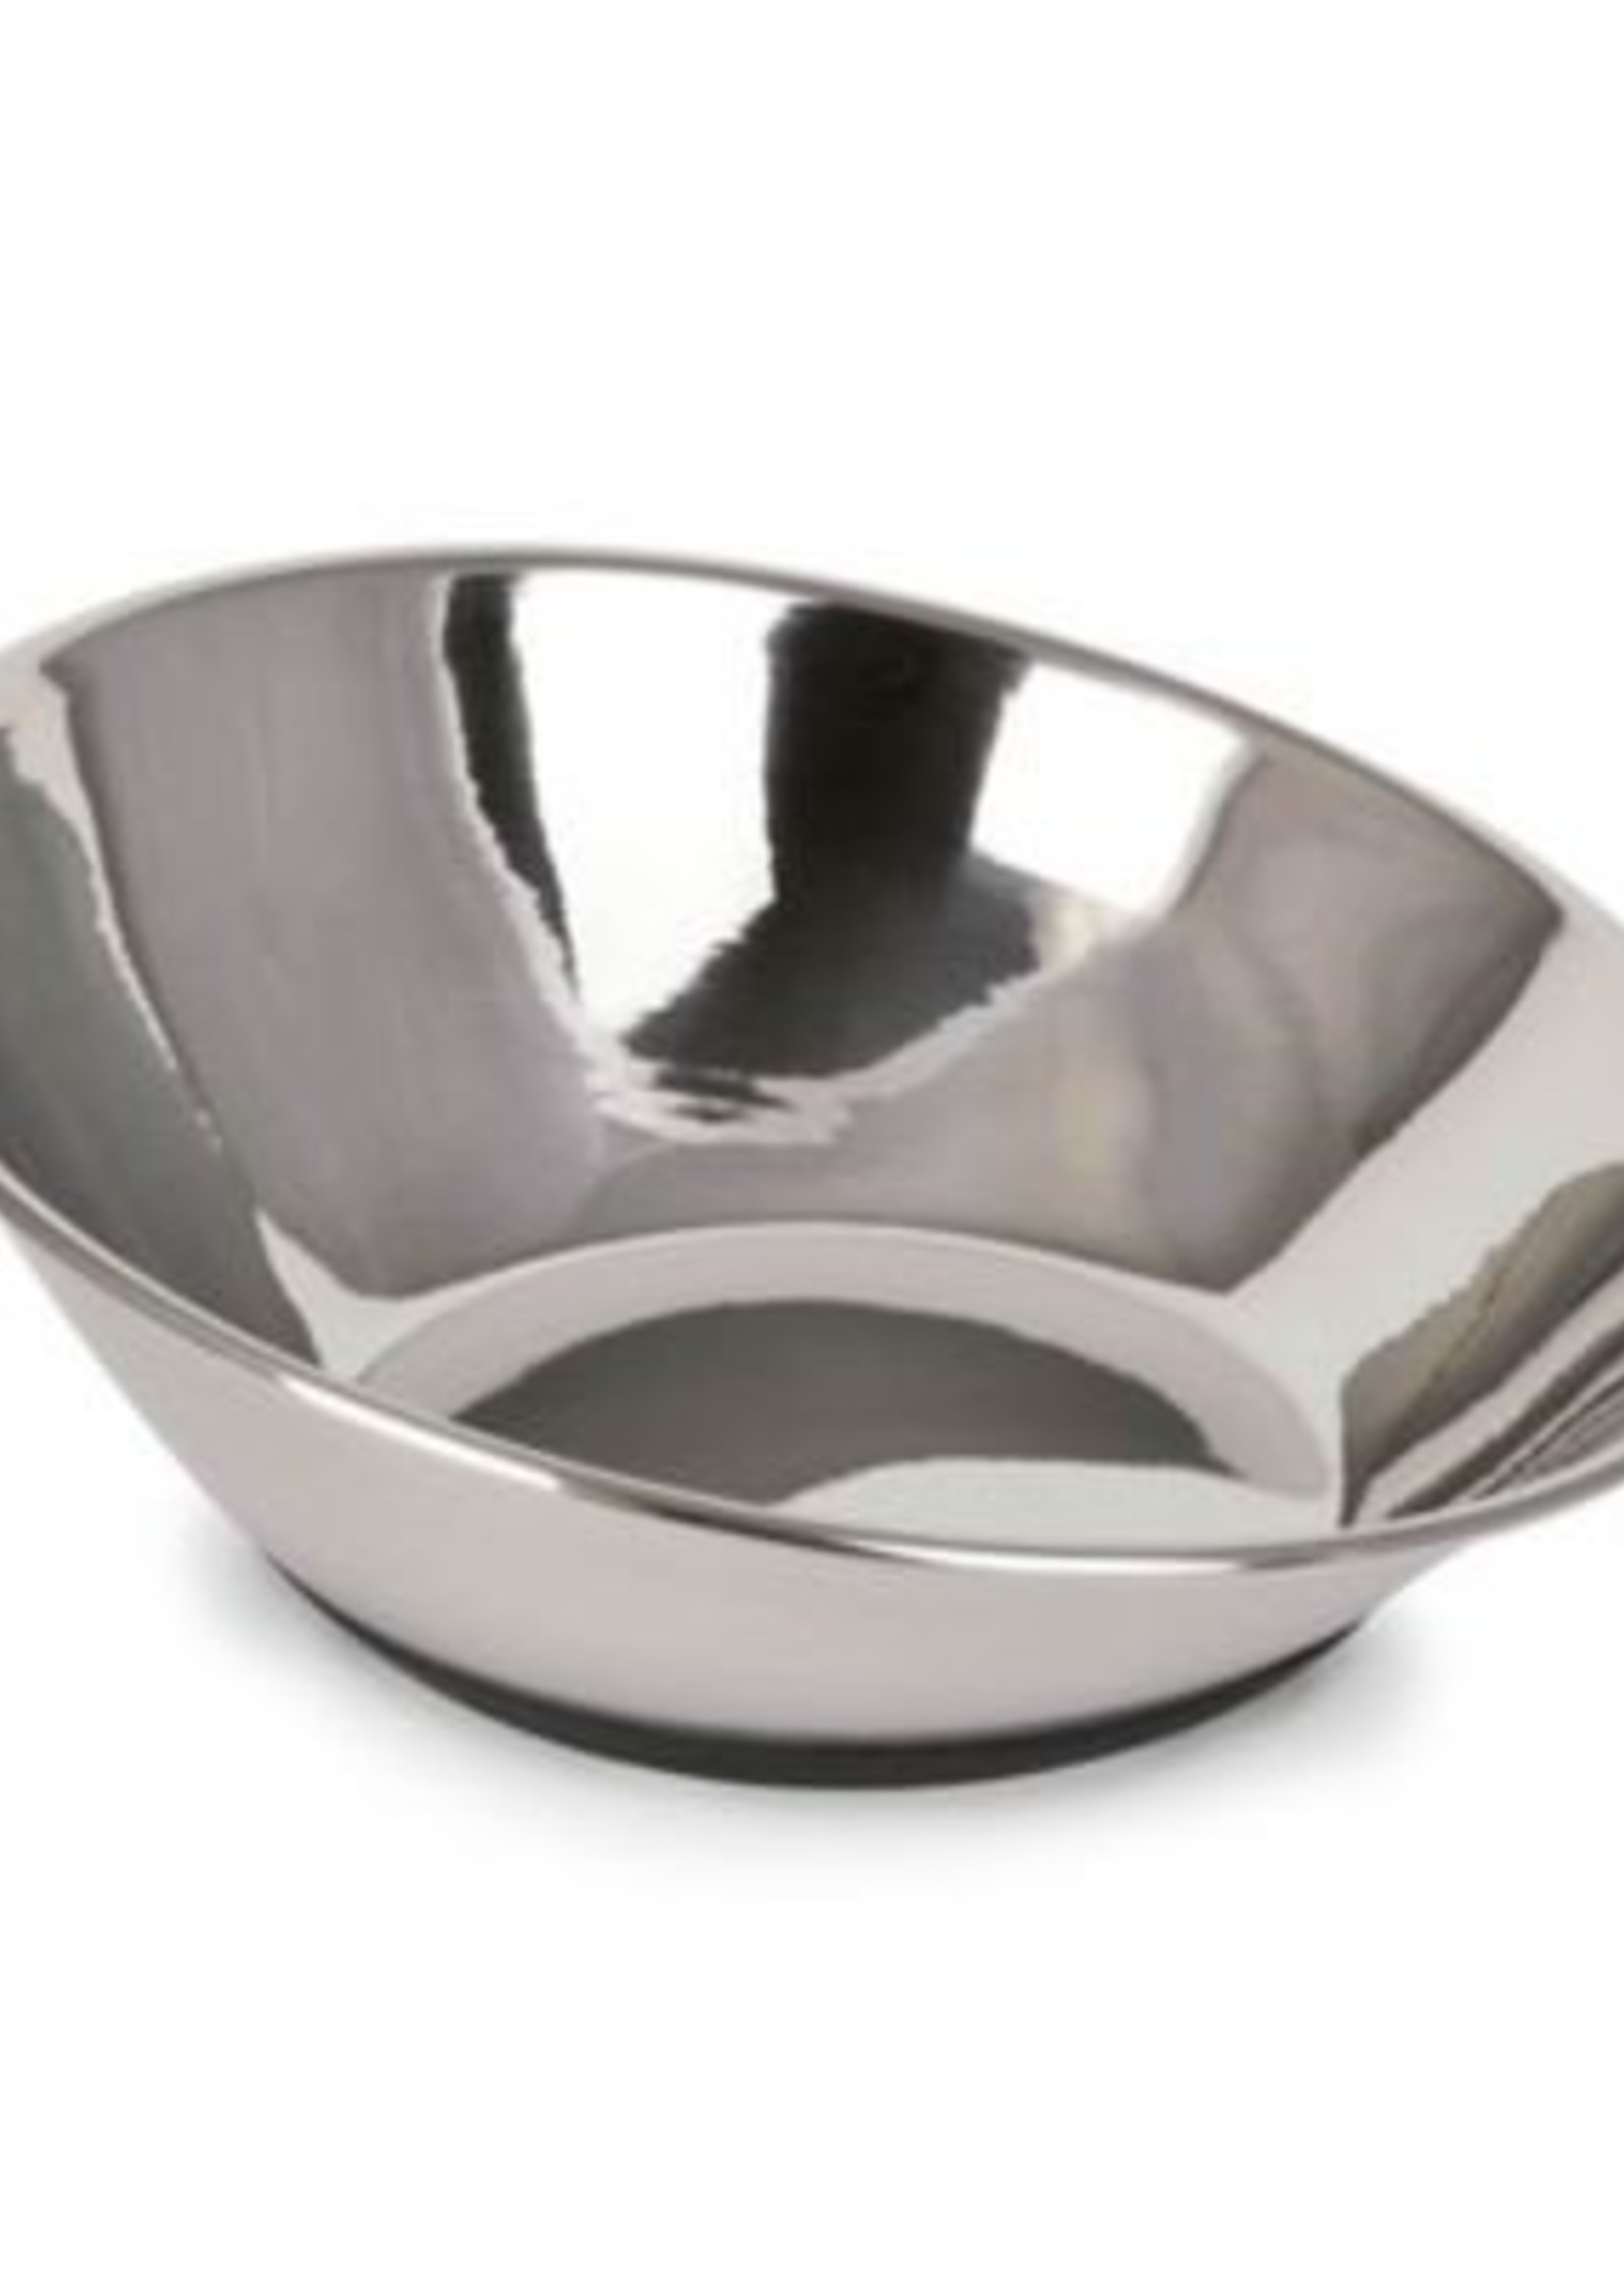 OUR PETS COMPANY OurPets Tilt-a-Bowl Medium